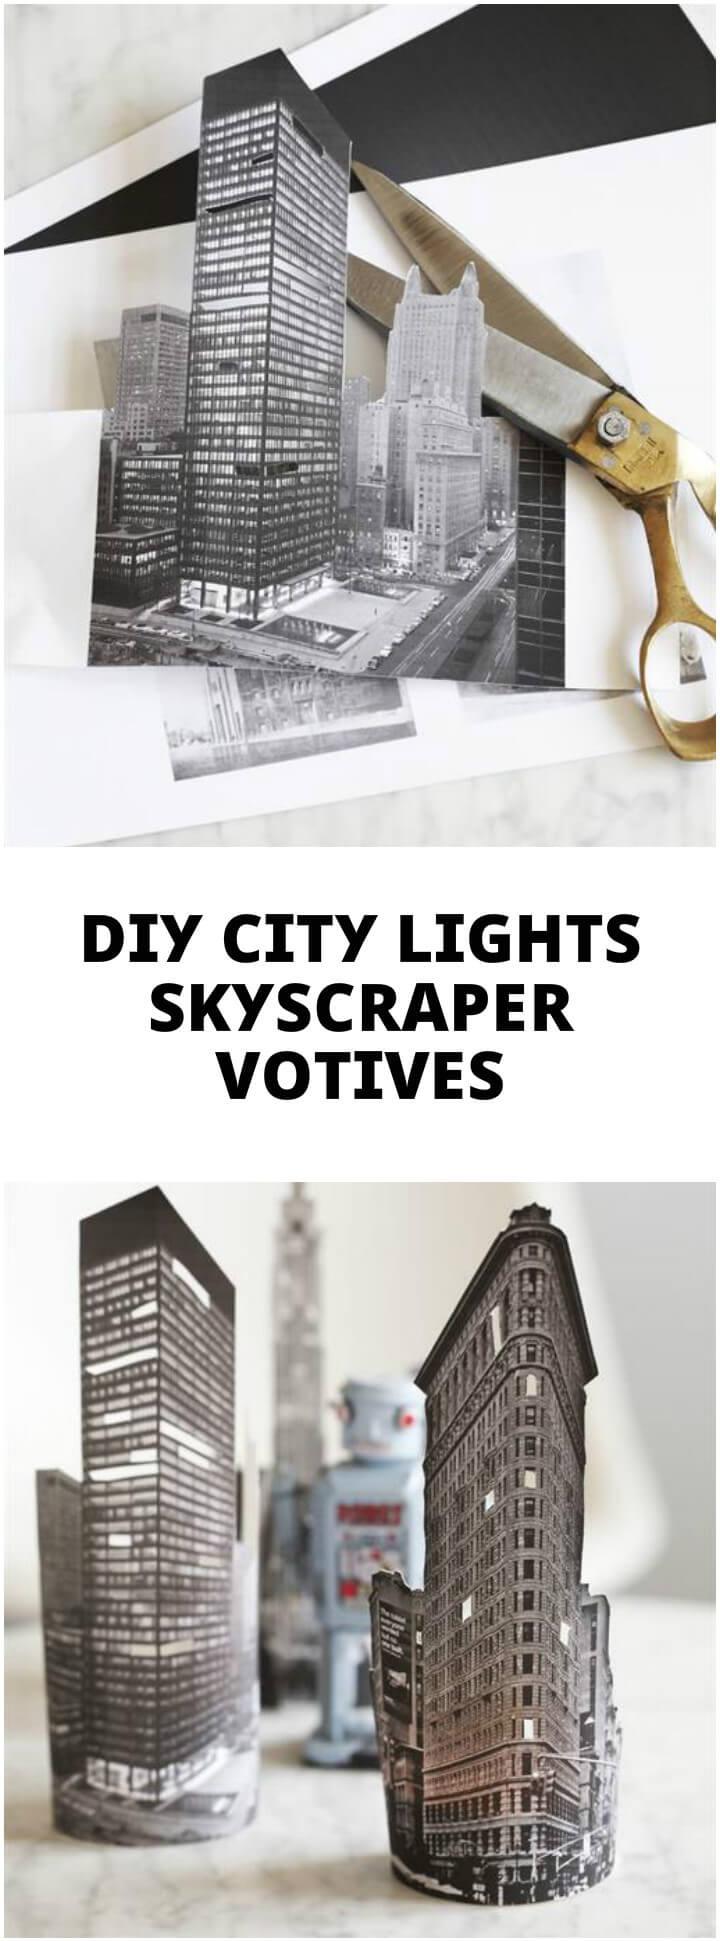 easy city lights skyscraper votives